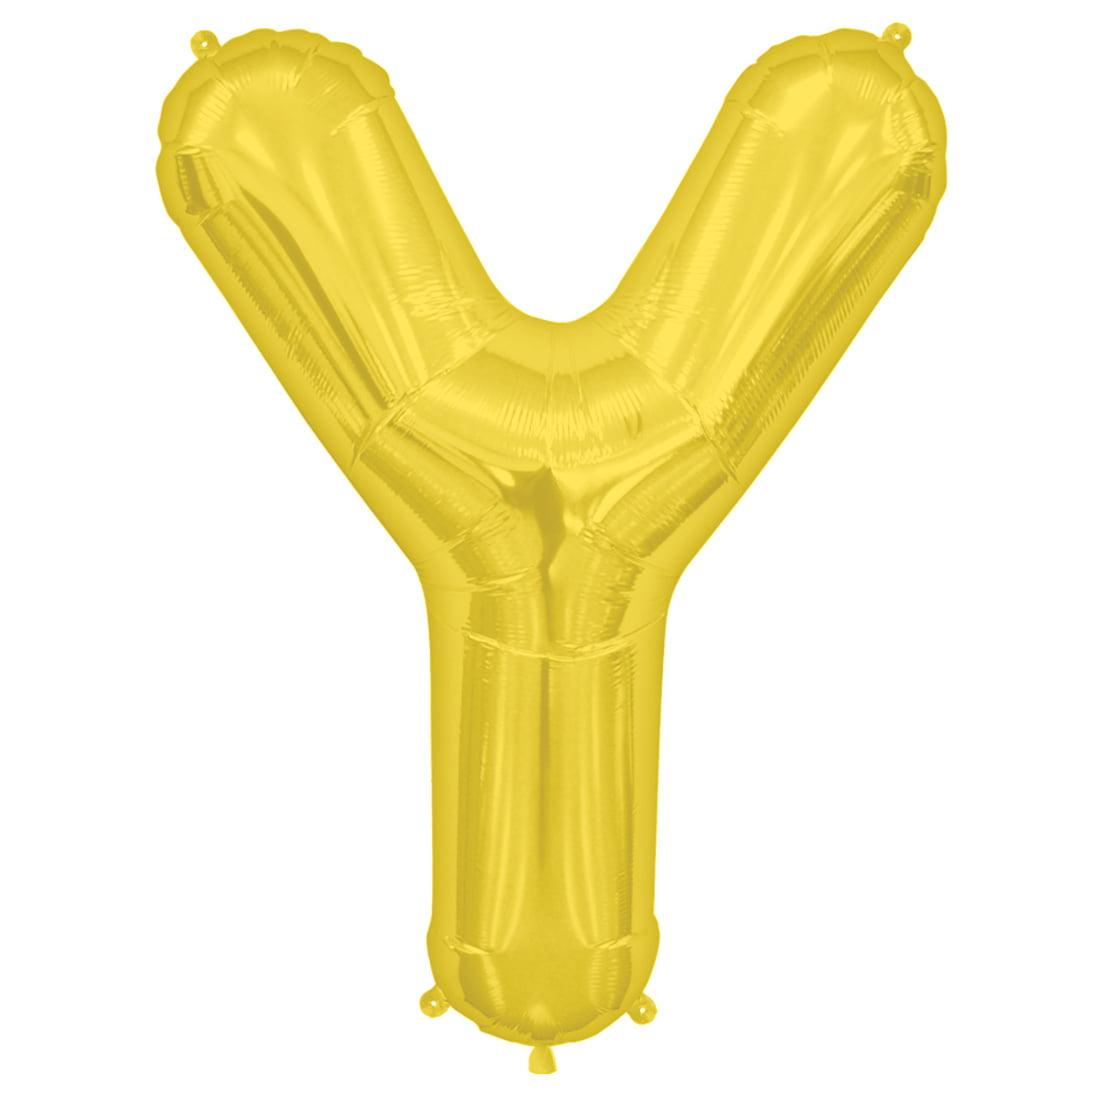 "Northstar Alphabet Letter Y Shape Solid Jumbo Helium 34"" Foil Balloon, Gold"